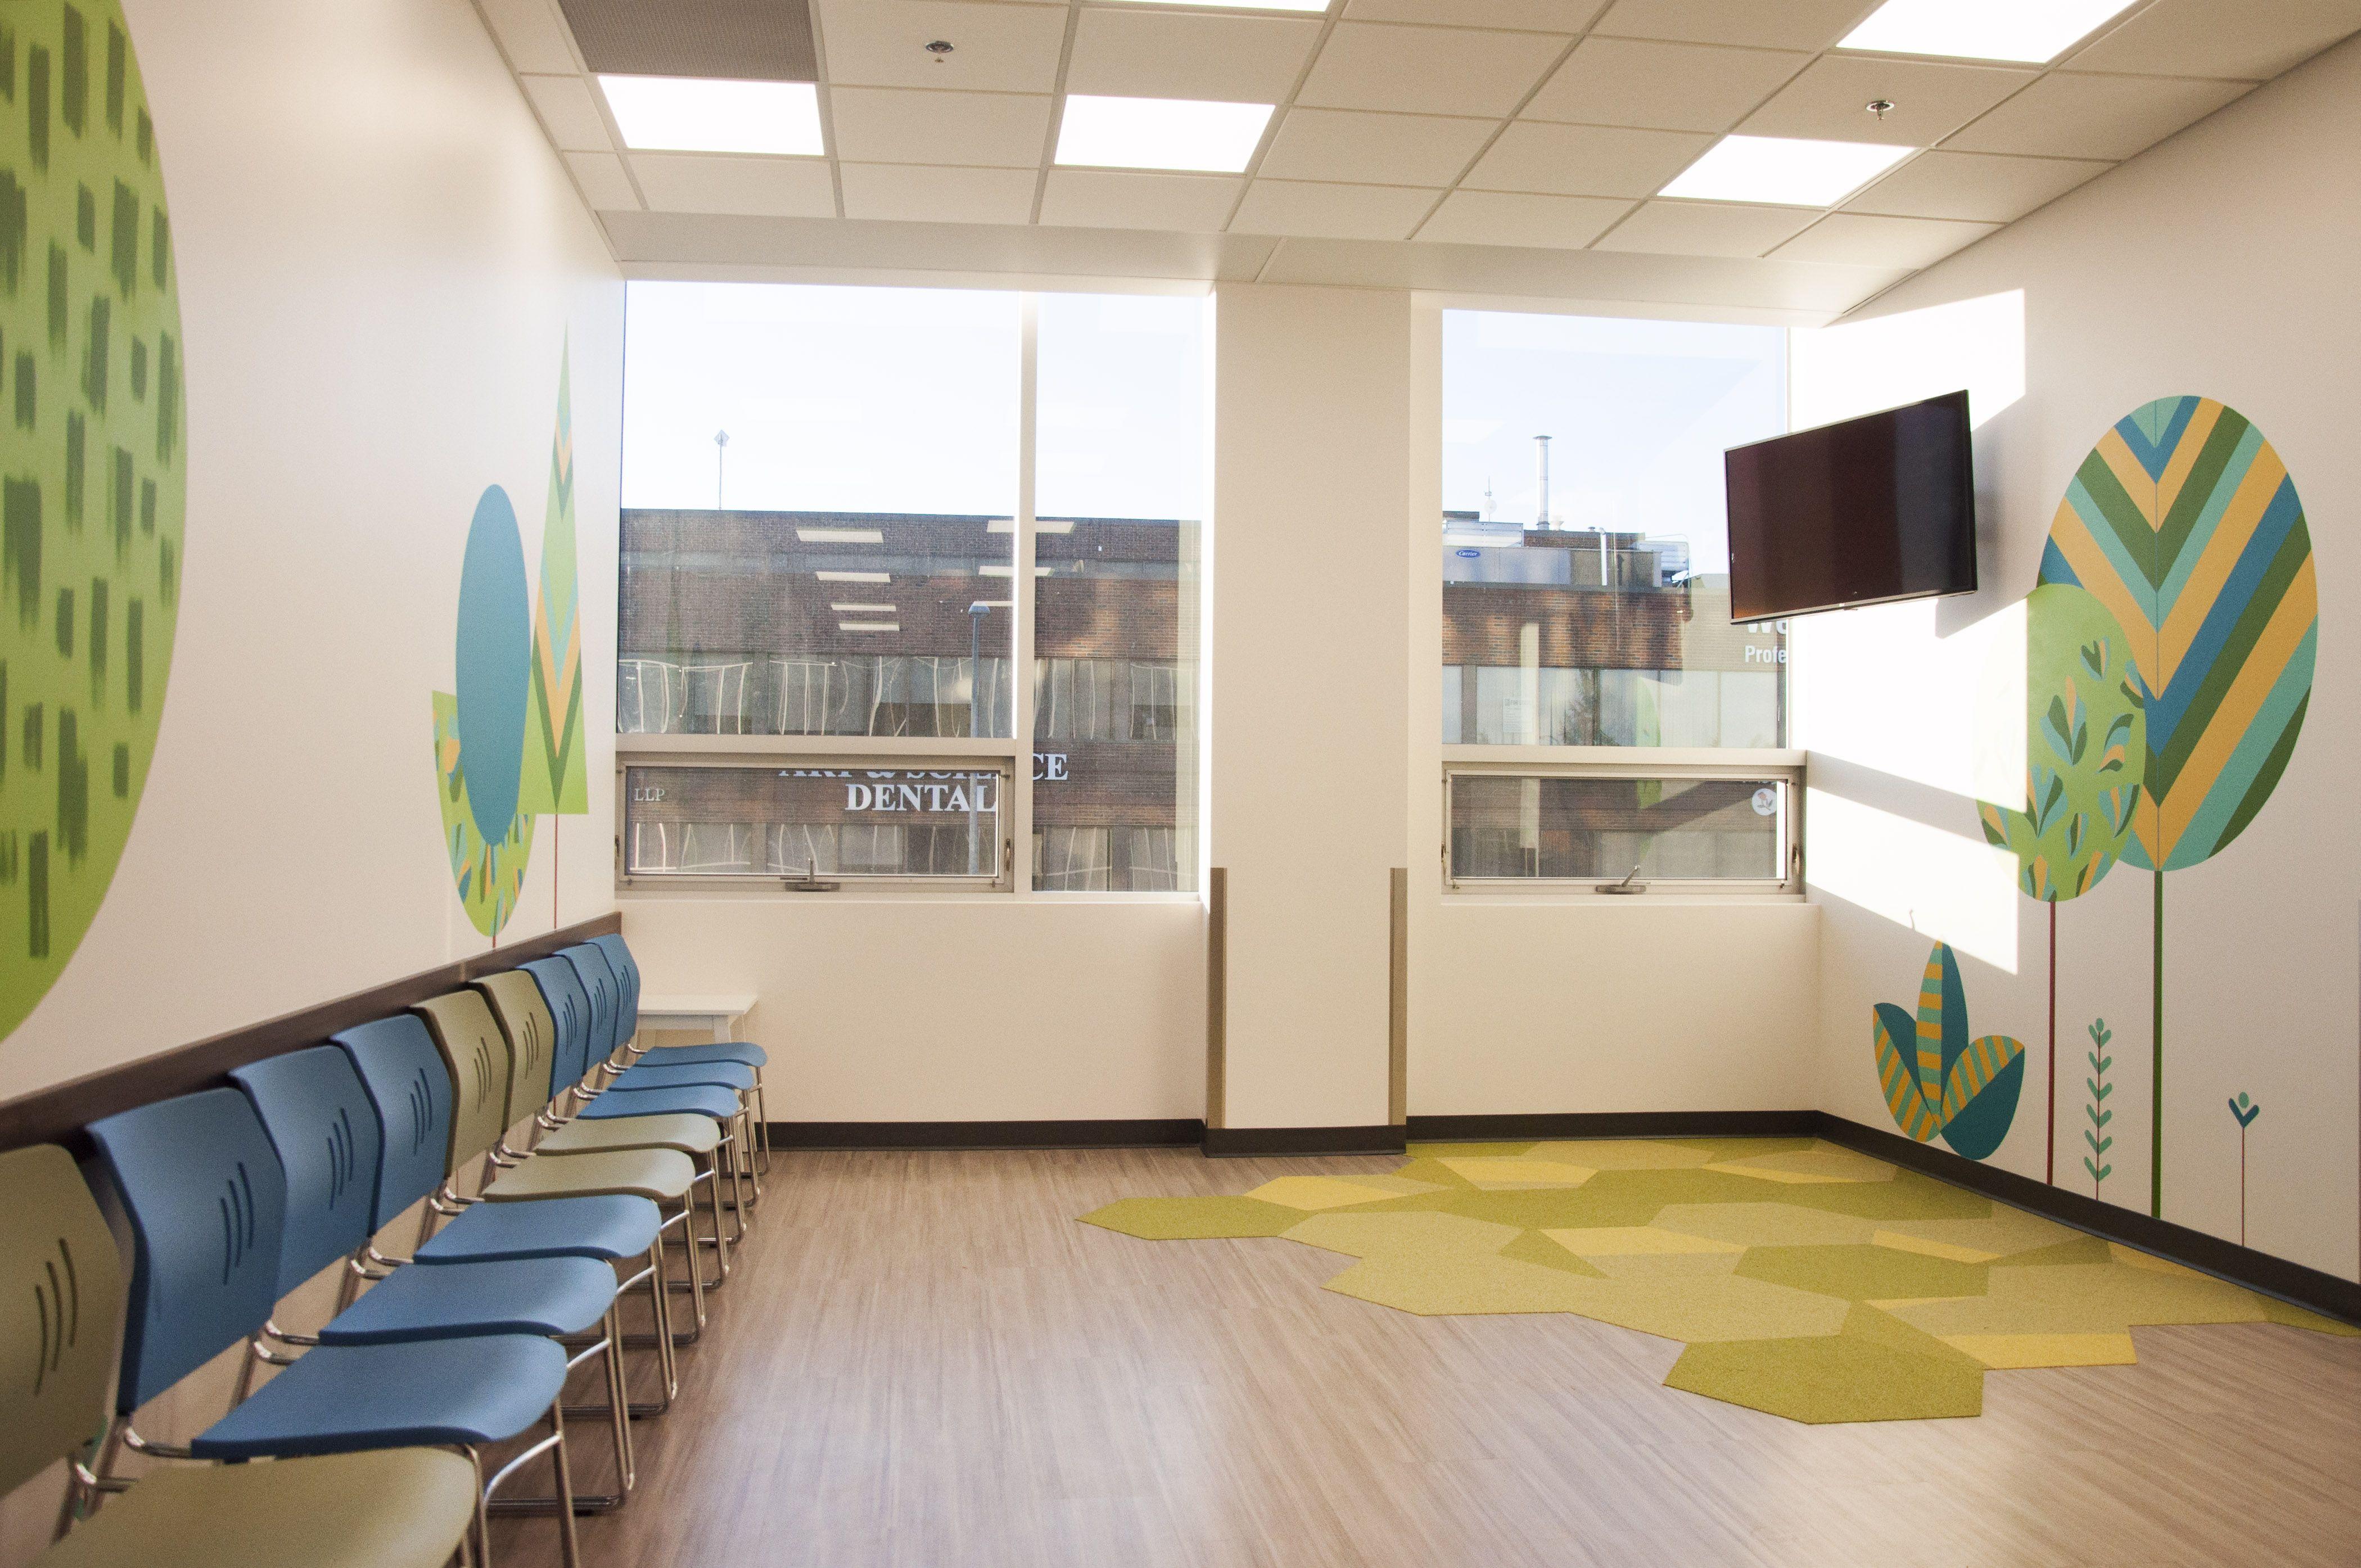 Glenora pediatric clinic in 2020 design clinic design